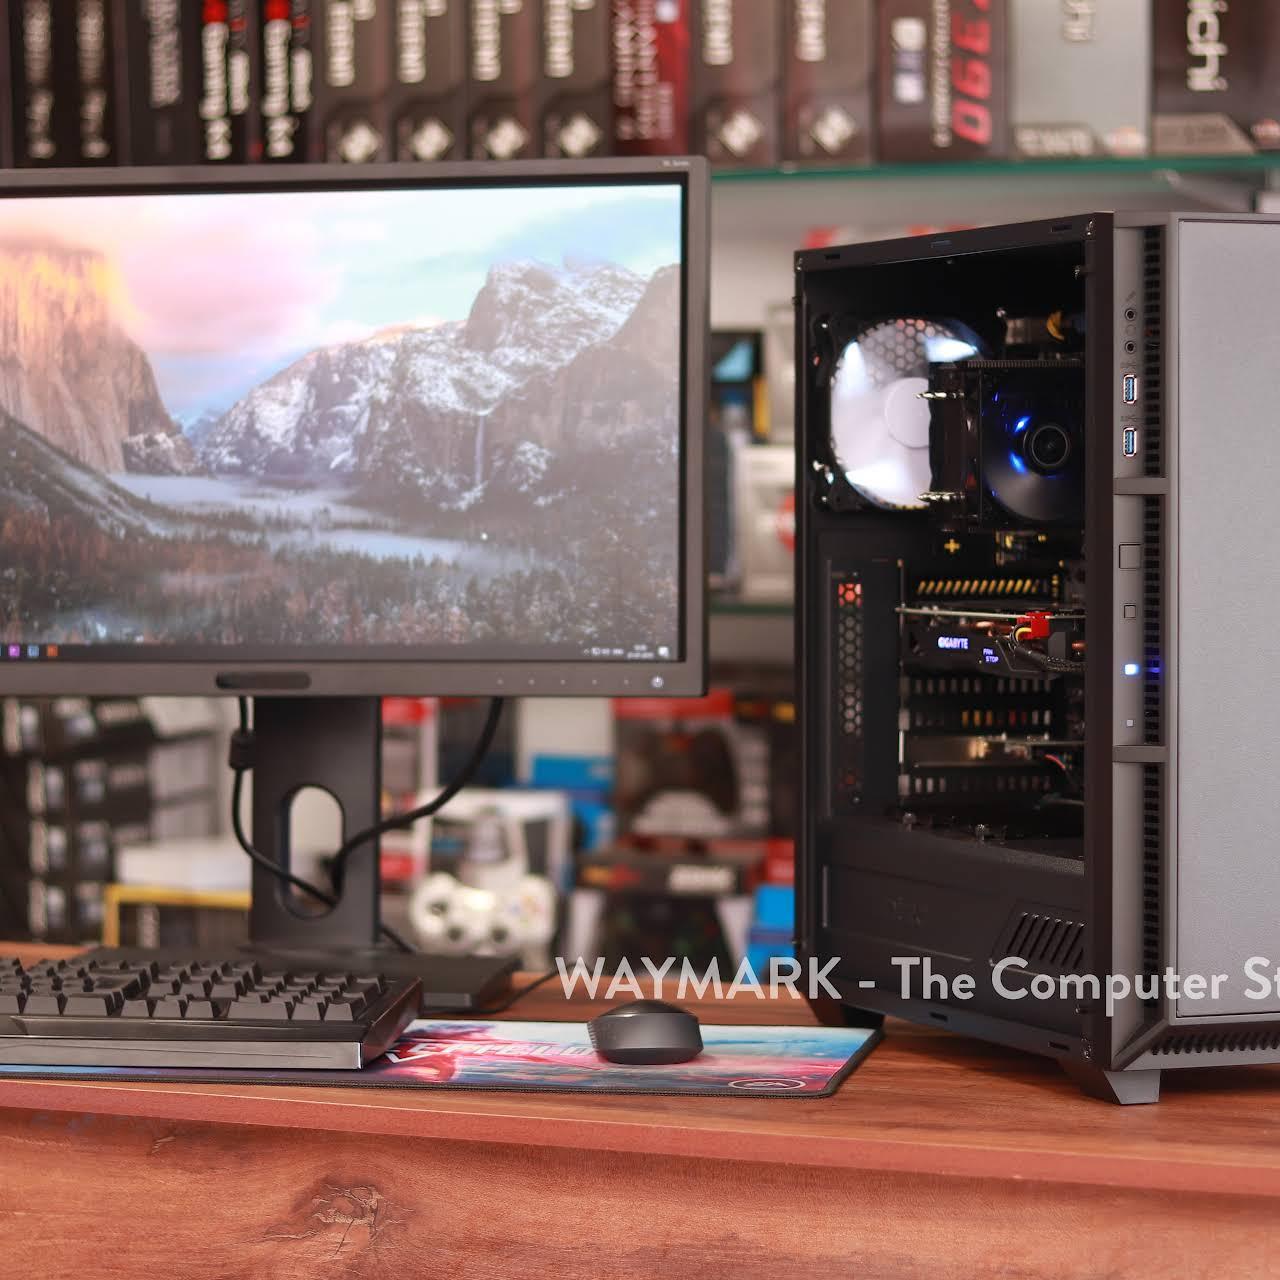 WAYMARK - The Computer Store - Computer Shop in Coimbatore